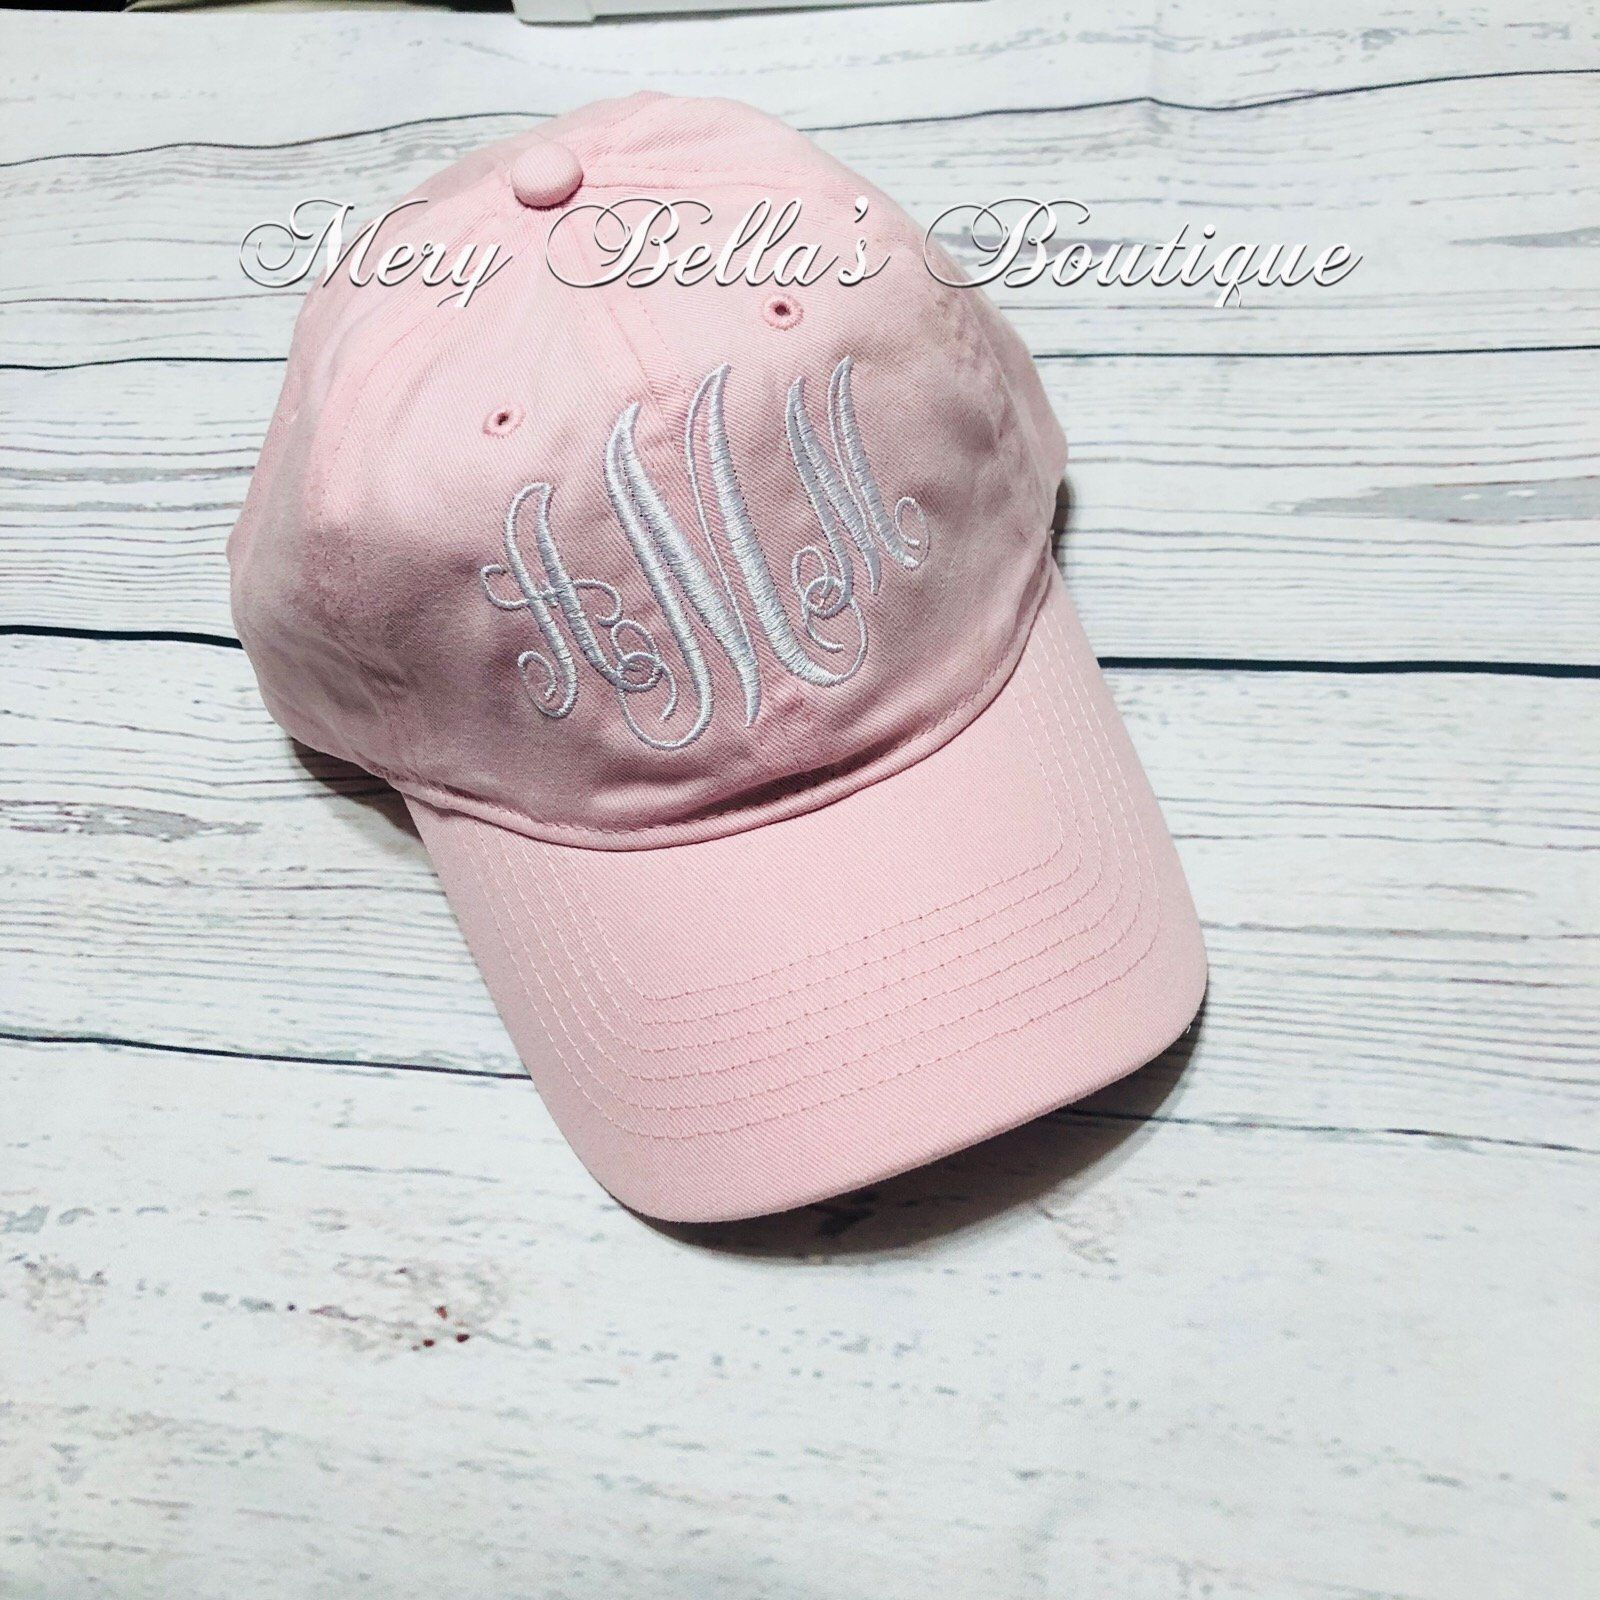 075f9cc705a Monogrammed hat